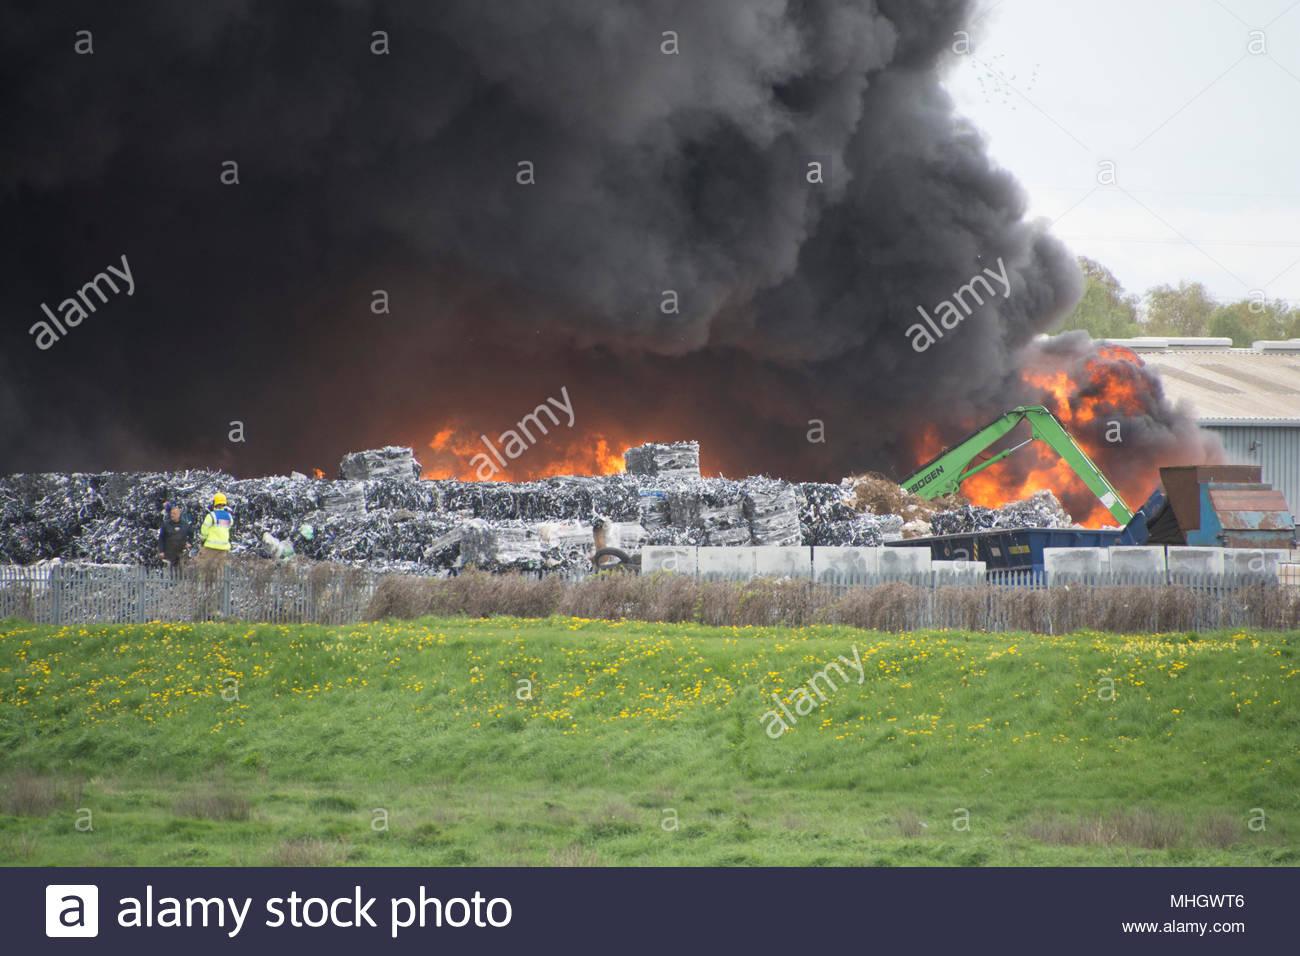 Sandycroft, Deeside, UK. 1st May, 2018. Recycling plant fire. Sandycroft, Deeside Credit: Lee Doherty/Alamy Live News Stock Photo